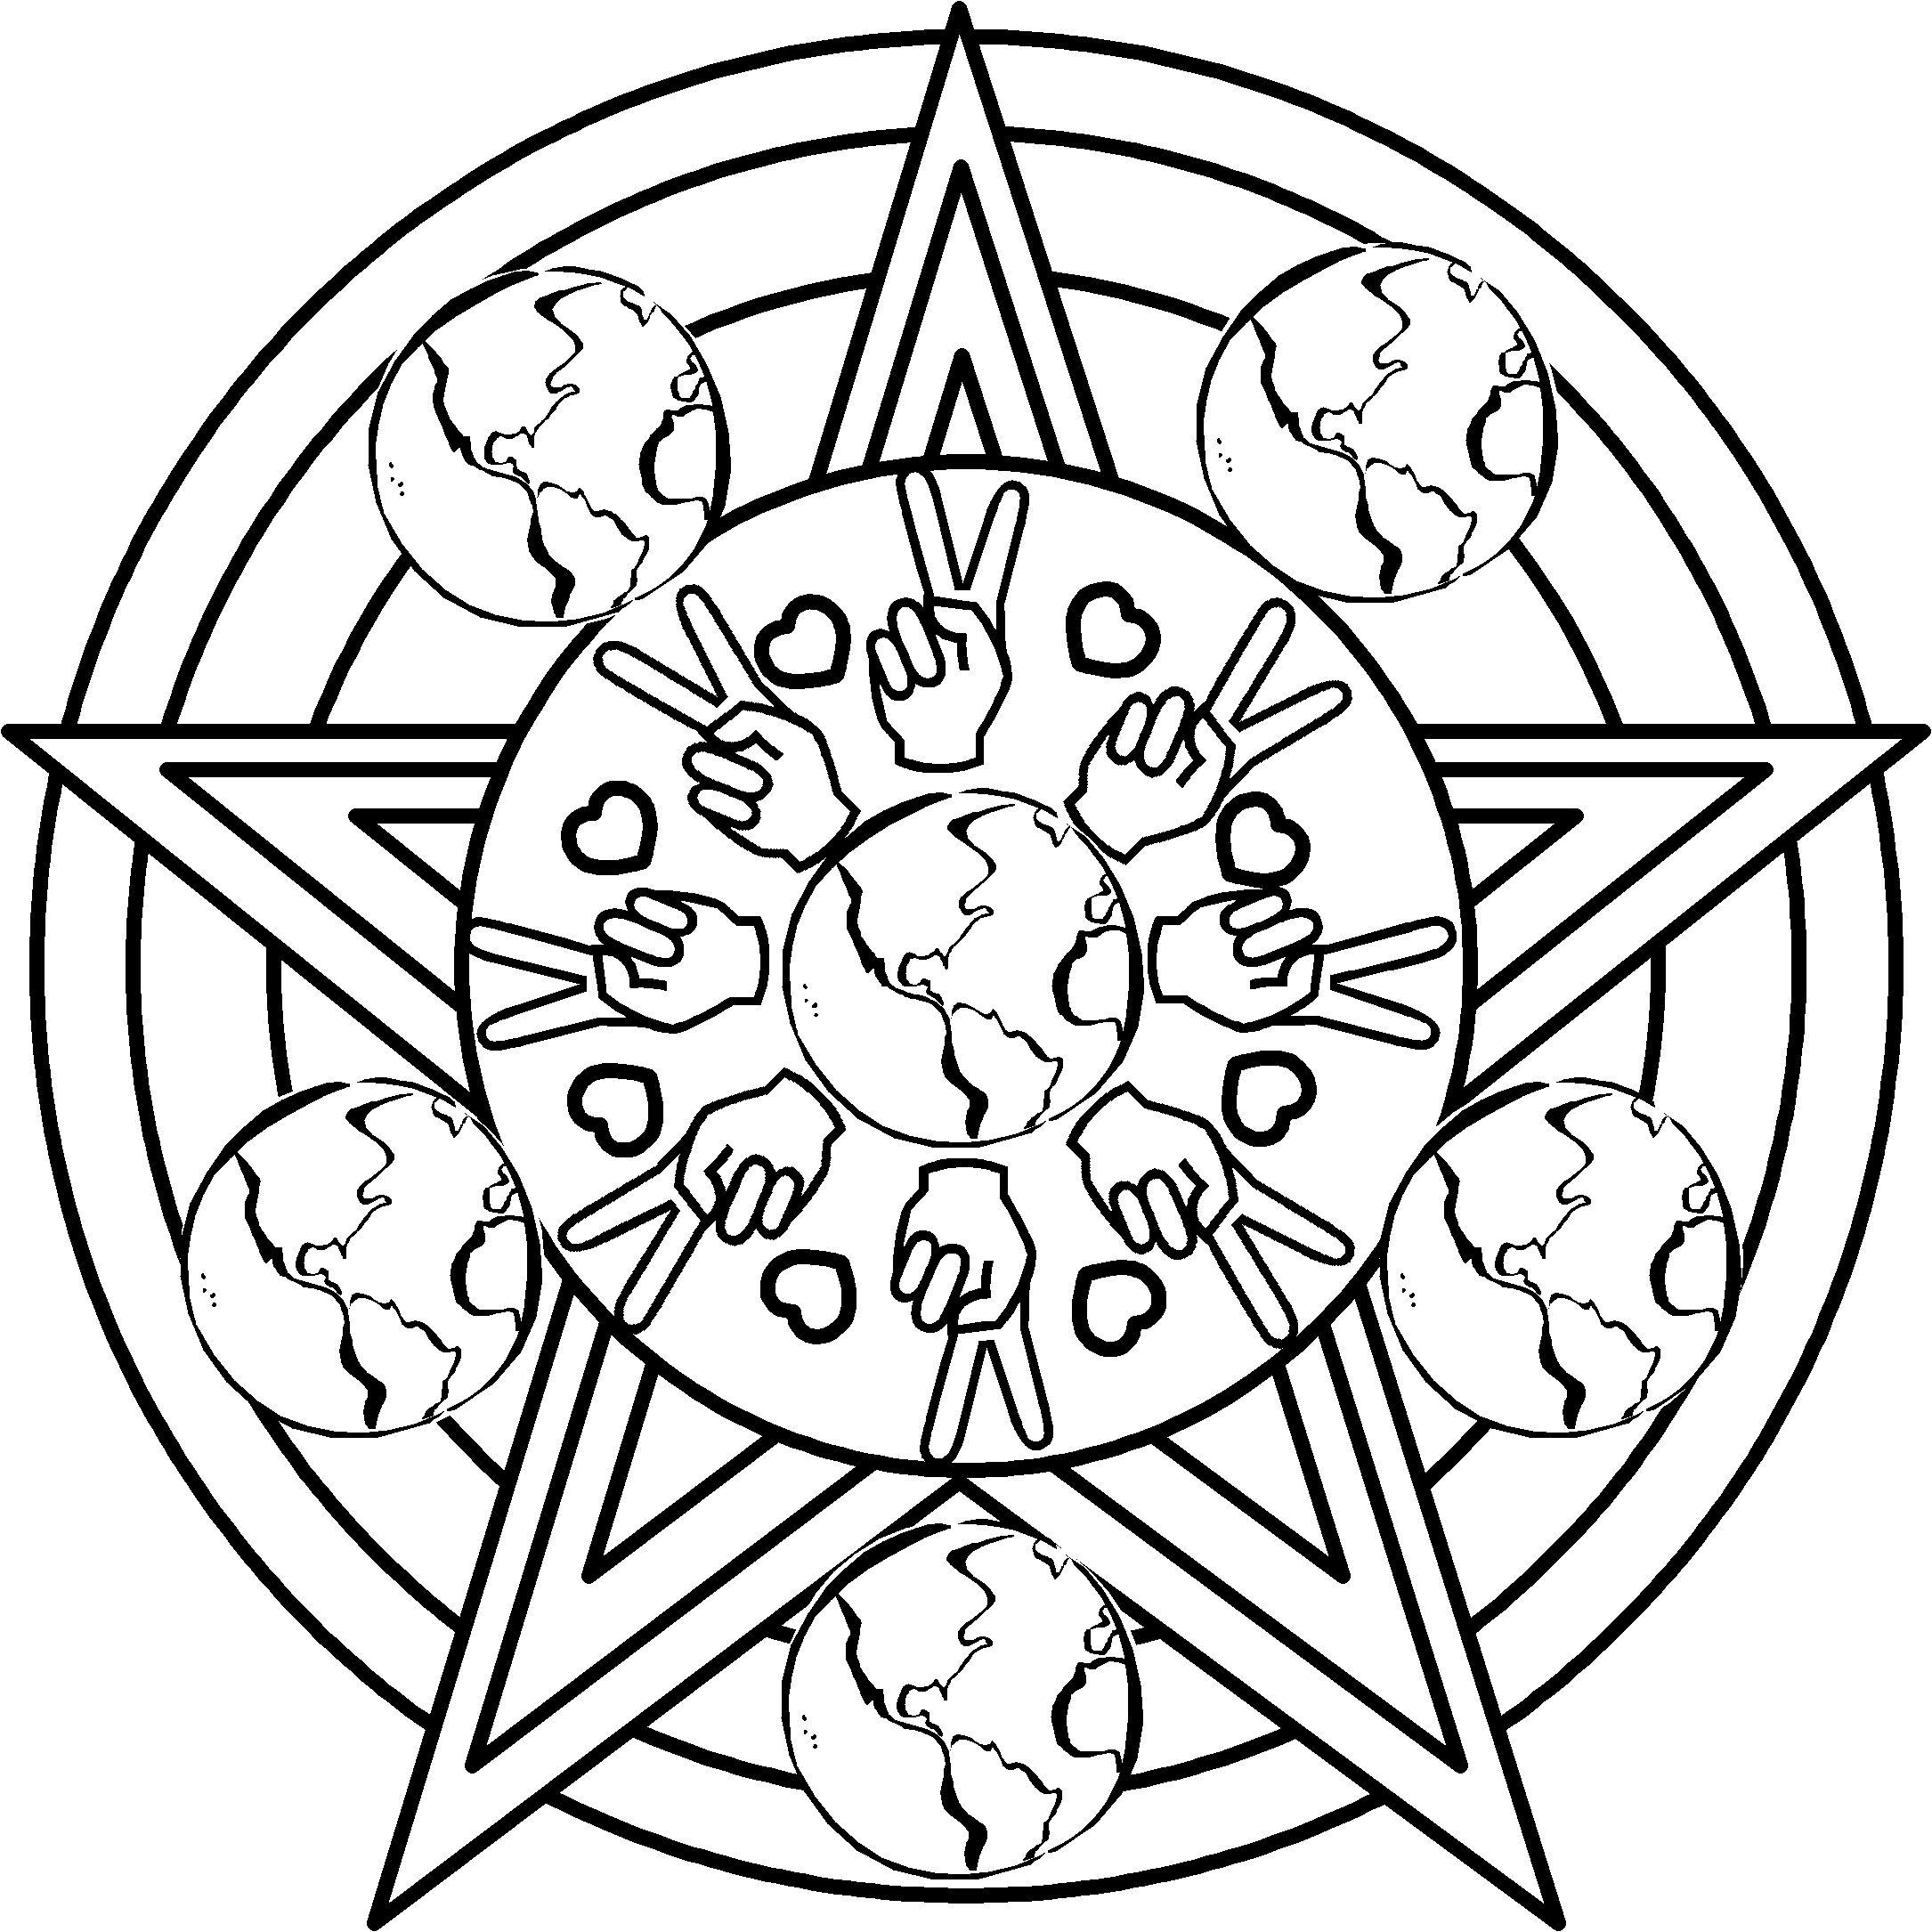 Mandalas de angeles para imprimir gratis - Imagui | Geometría ...